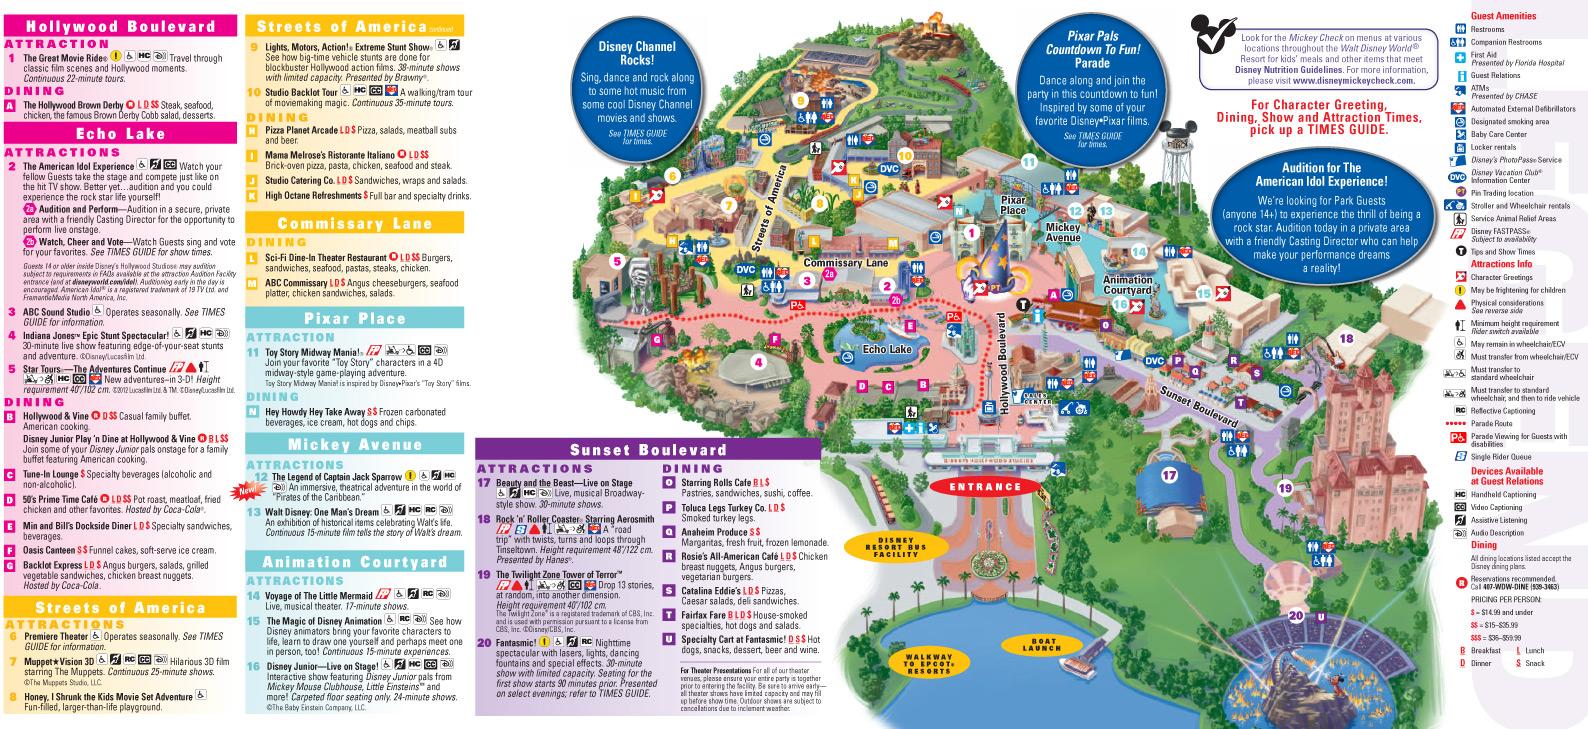 Walt Disney World Resort Map 2013